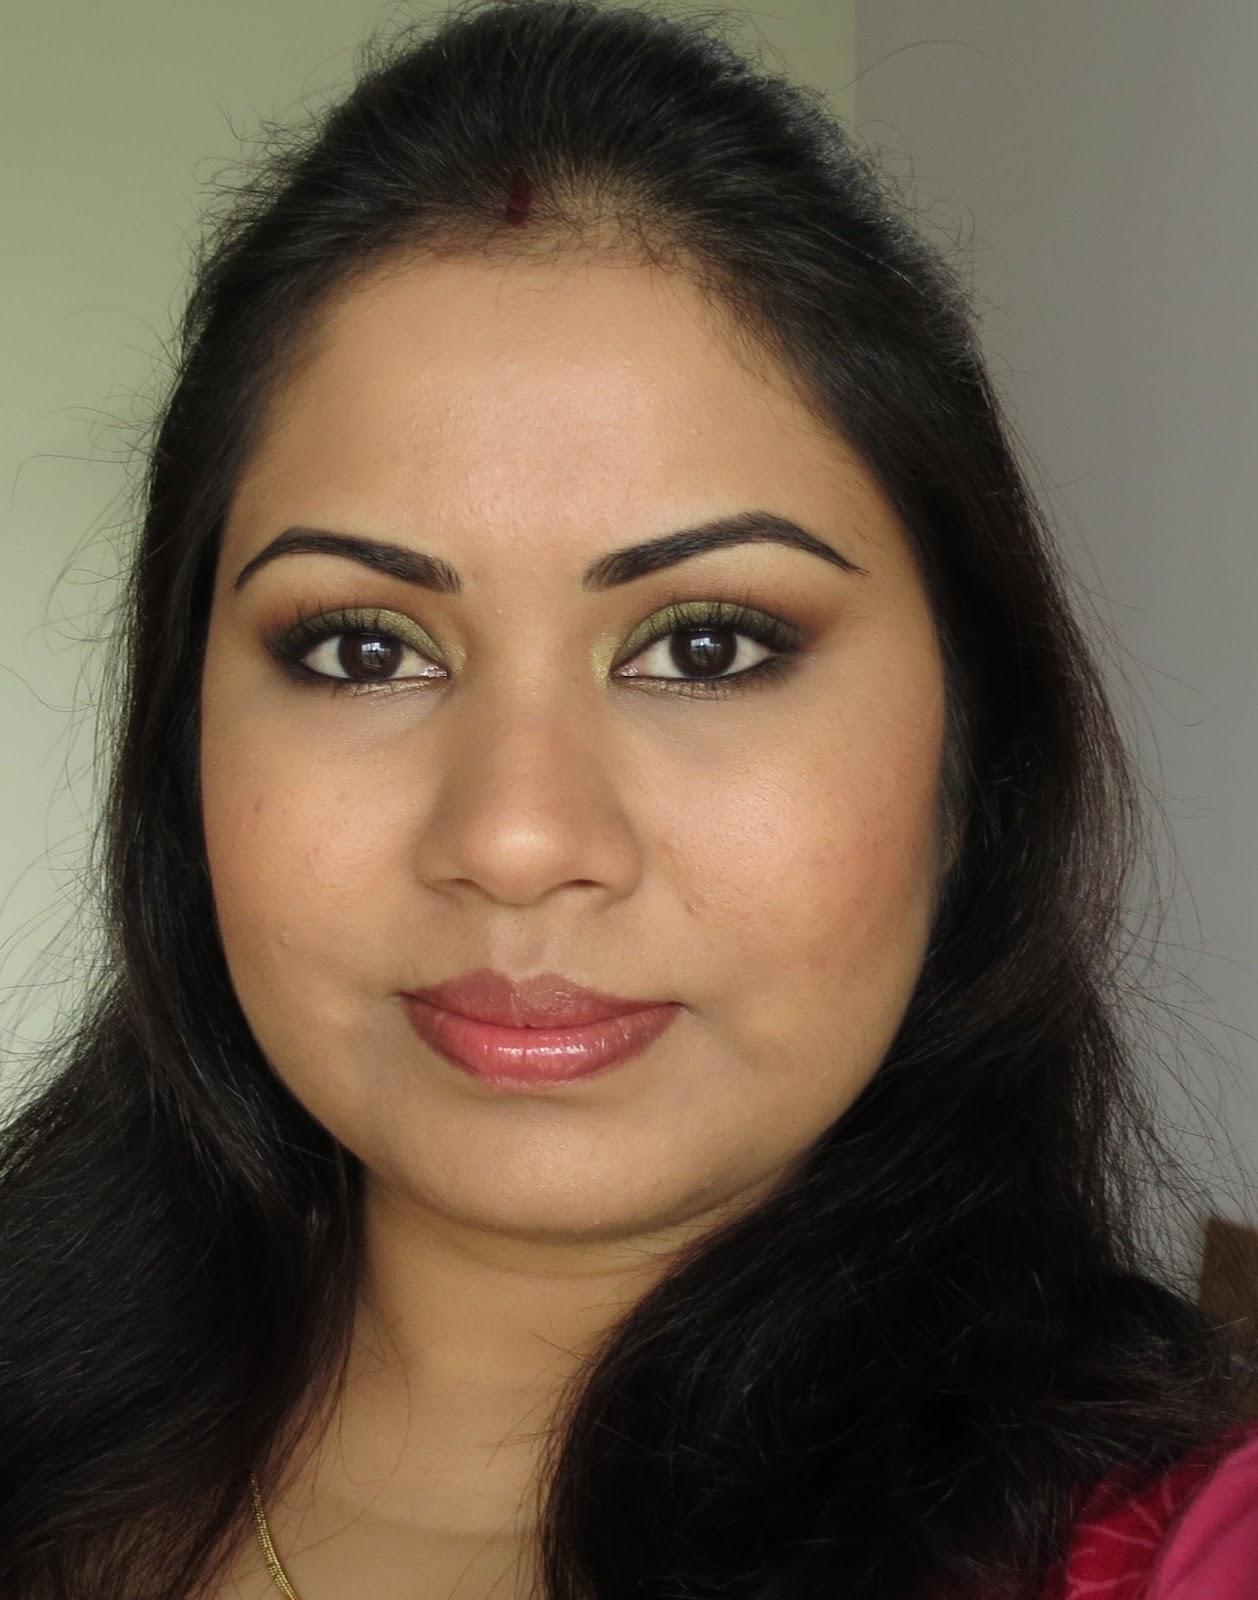 Mac brun eyeshadow for brows